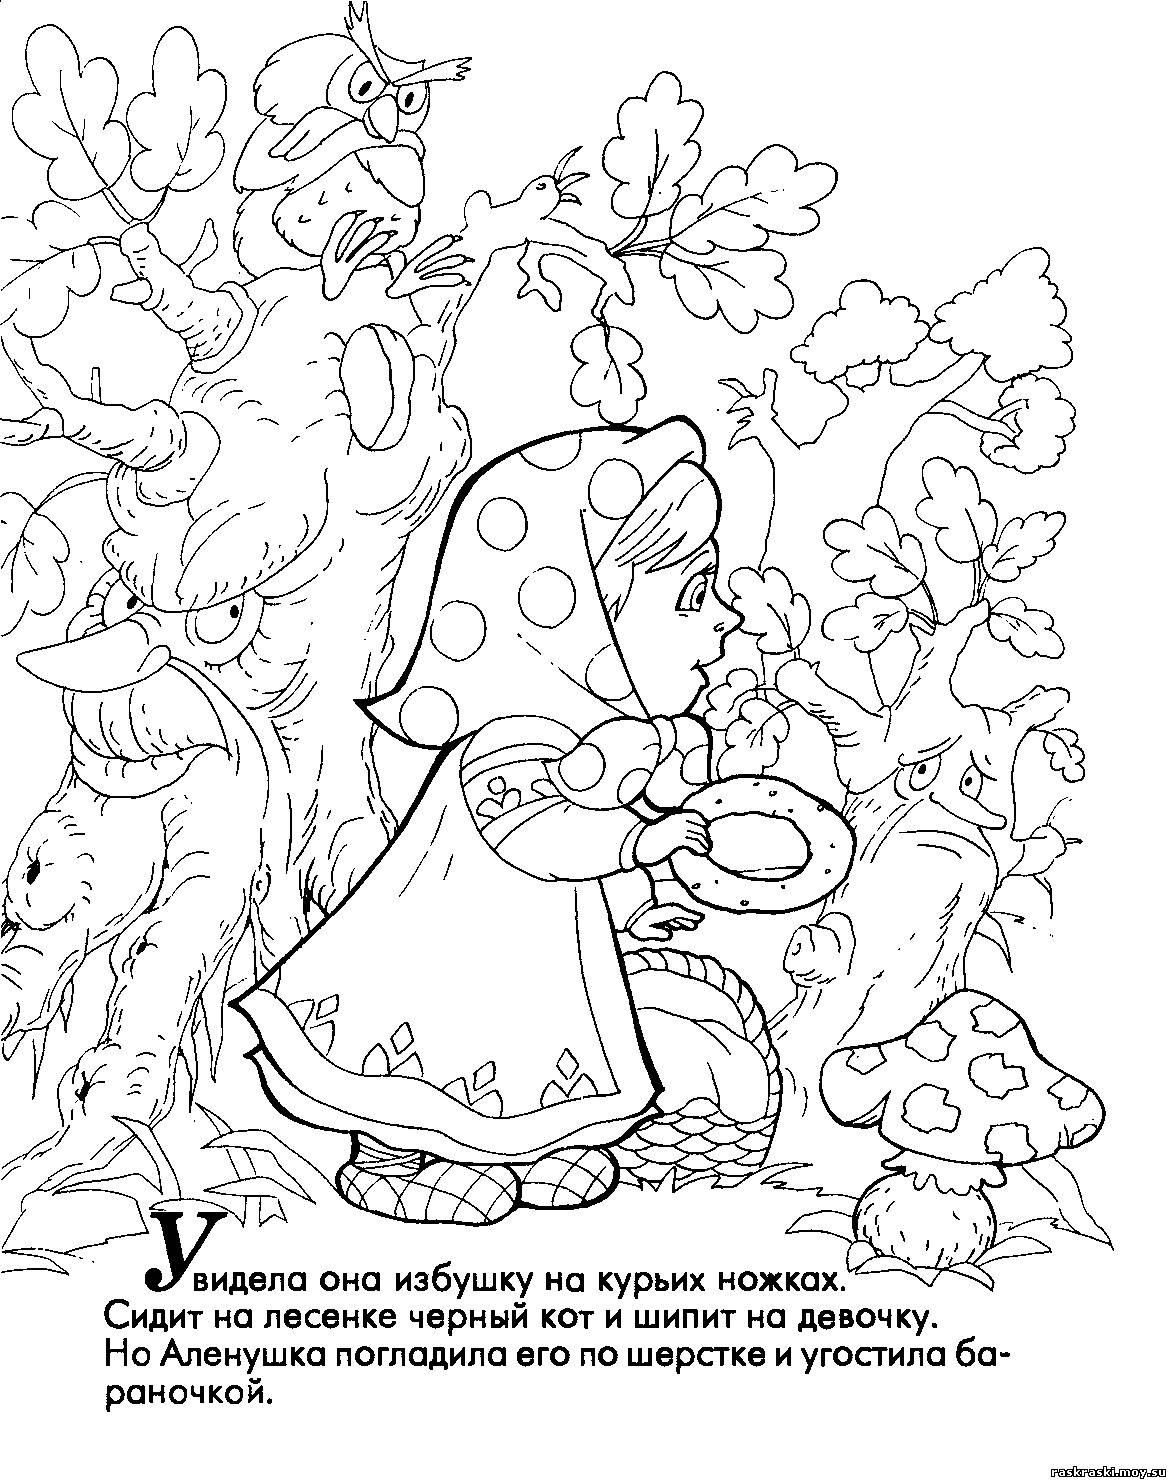 Баба Яга - Раскраски - Сборник раскрасок - Раскраски для детей